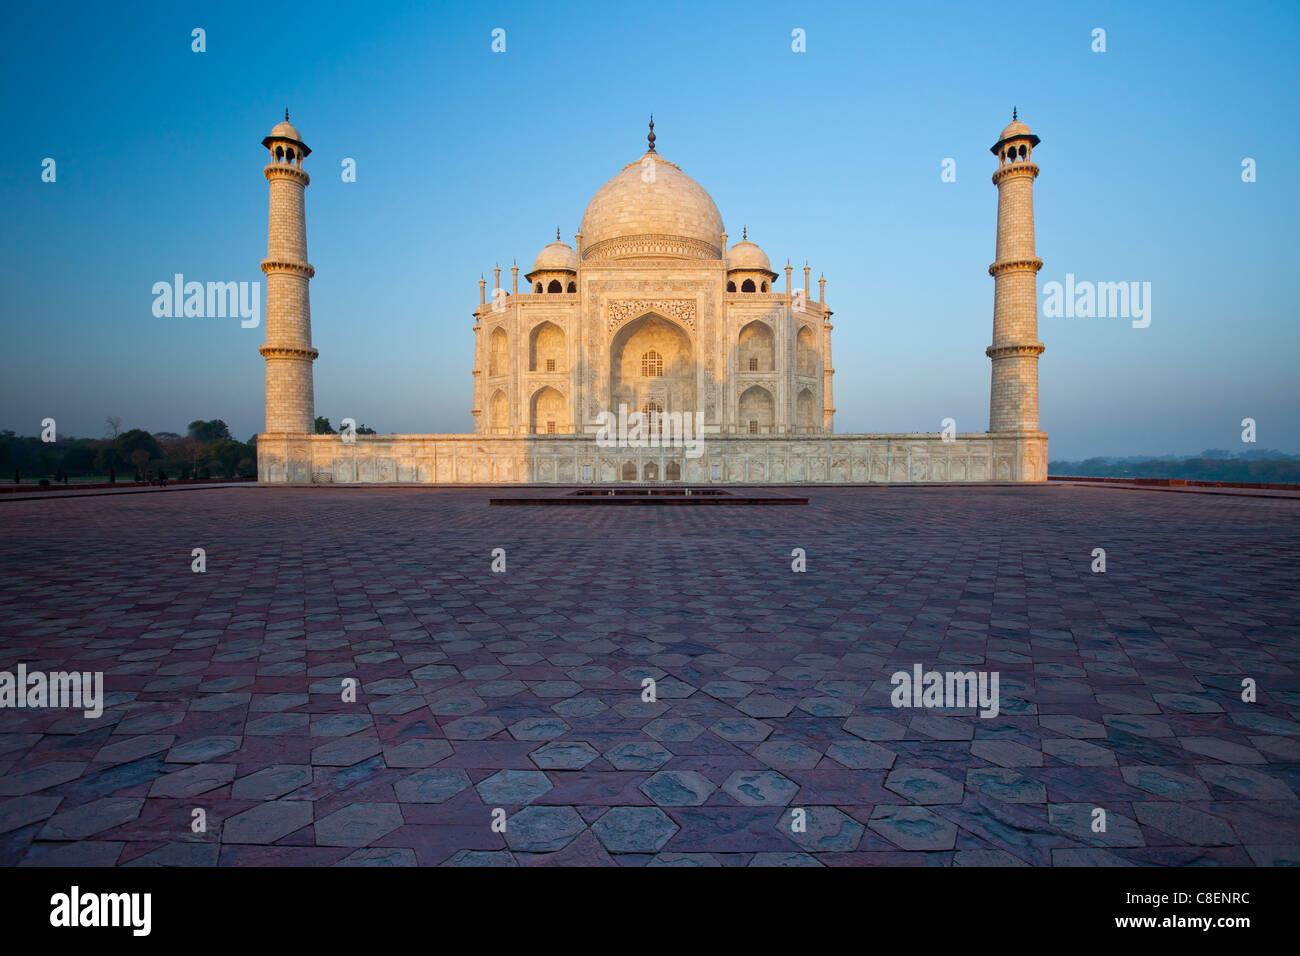 The Taj Mahal mausoleum eastern view (viewed from Taj Mahal Mosque), Uttar Pradesh, India - Stock Image